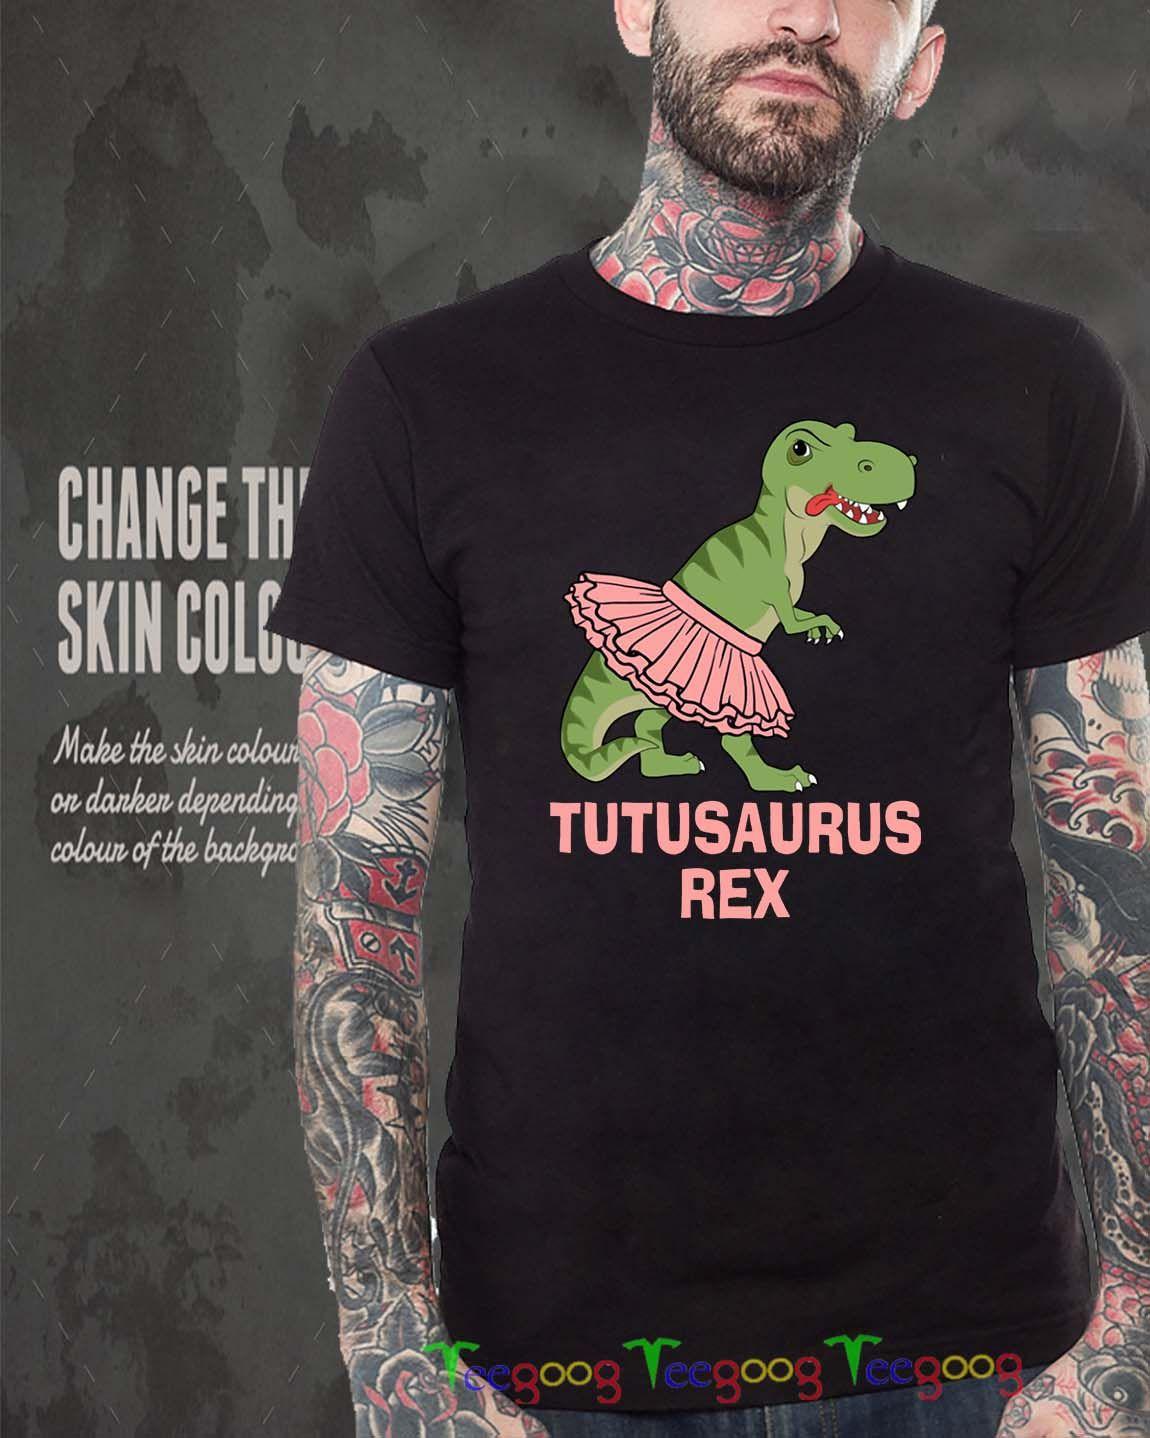 d08e0f06 Tutusaurus Rex Funny Dinosaur T-Rex Gift Shirt | TrendShirt ...